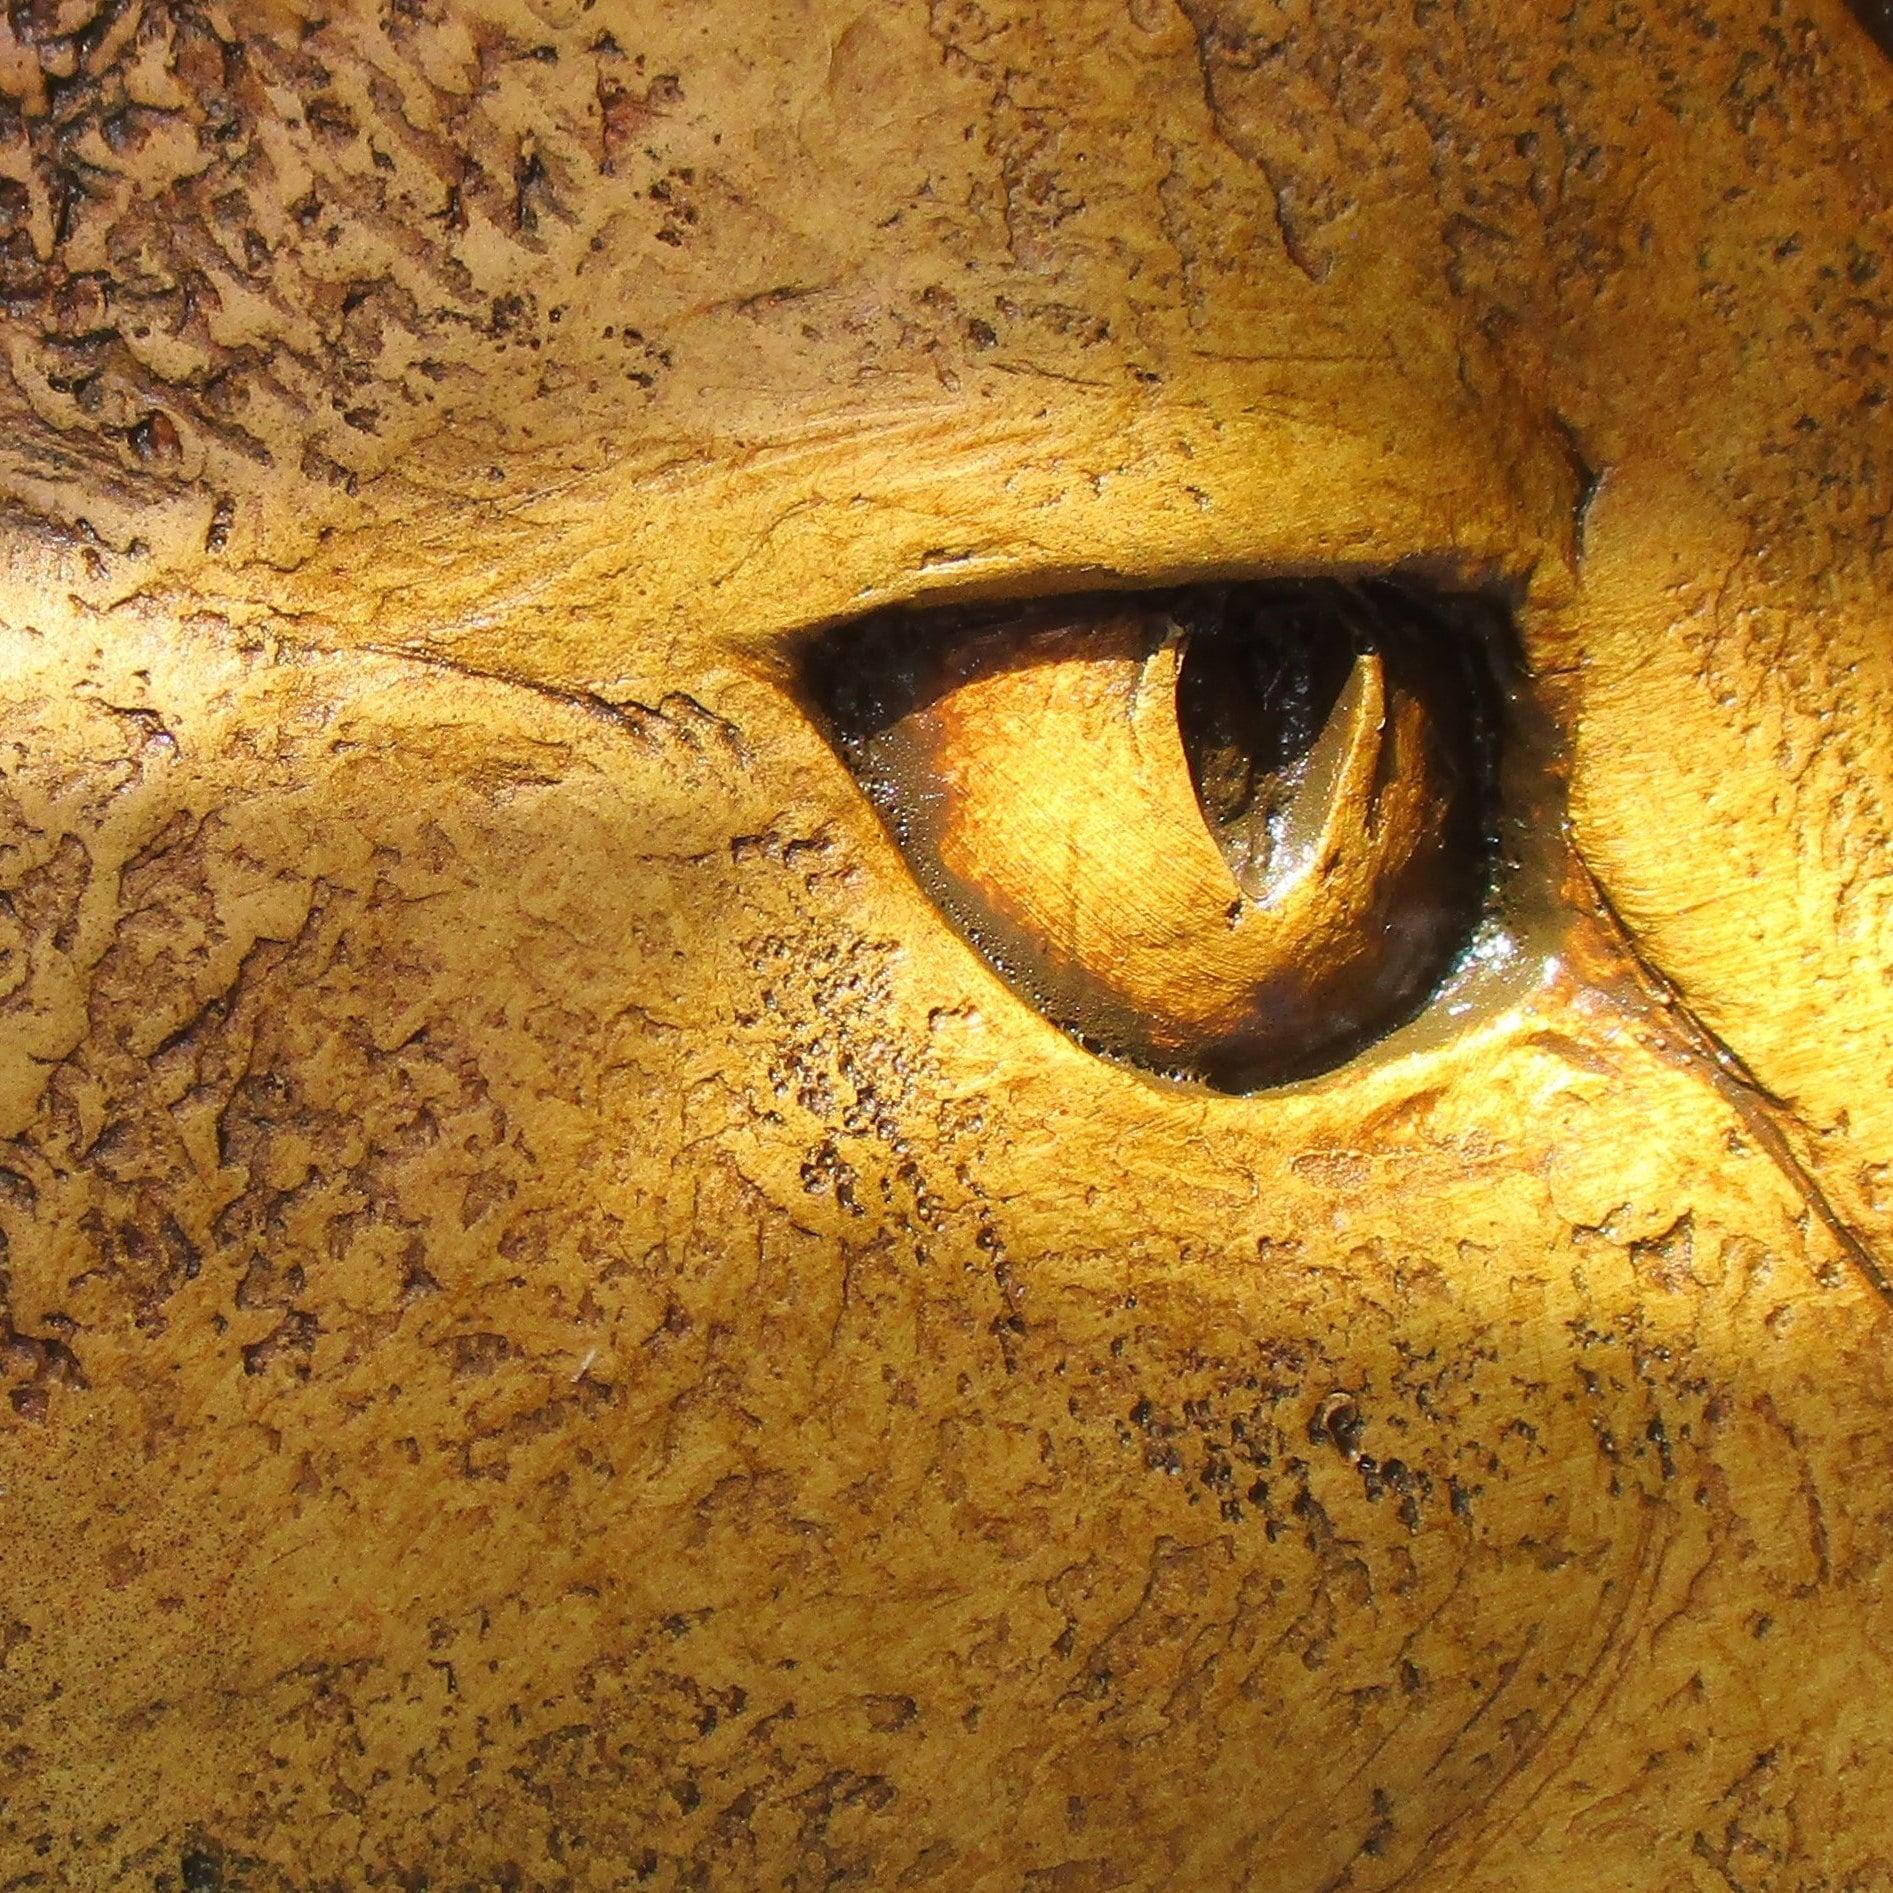 Animal Sculpture Paintings and Decorative Art by SculptureGeek